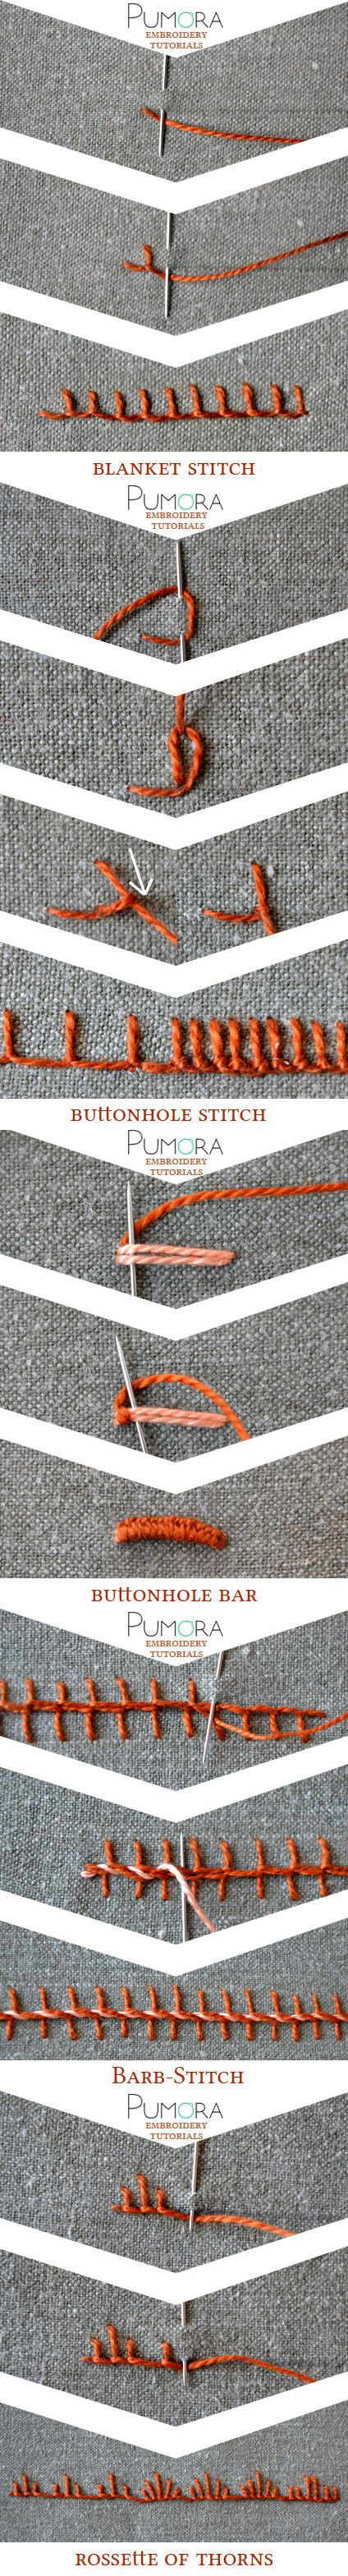 embroidery tutorials: blanket stitch with variations broderie, sticken, ricamo, bordado